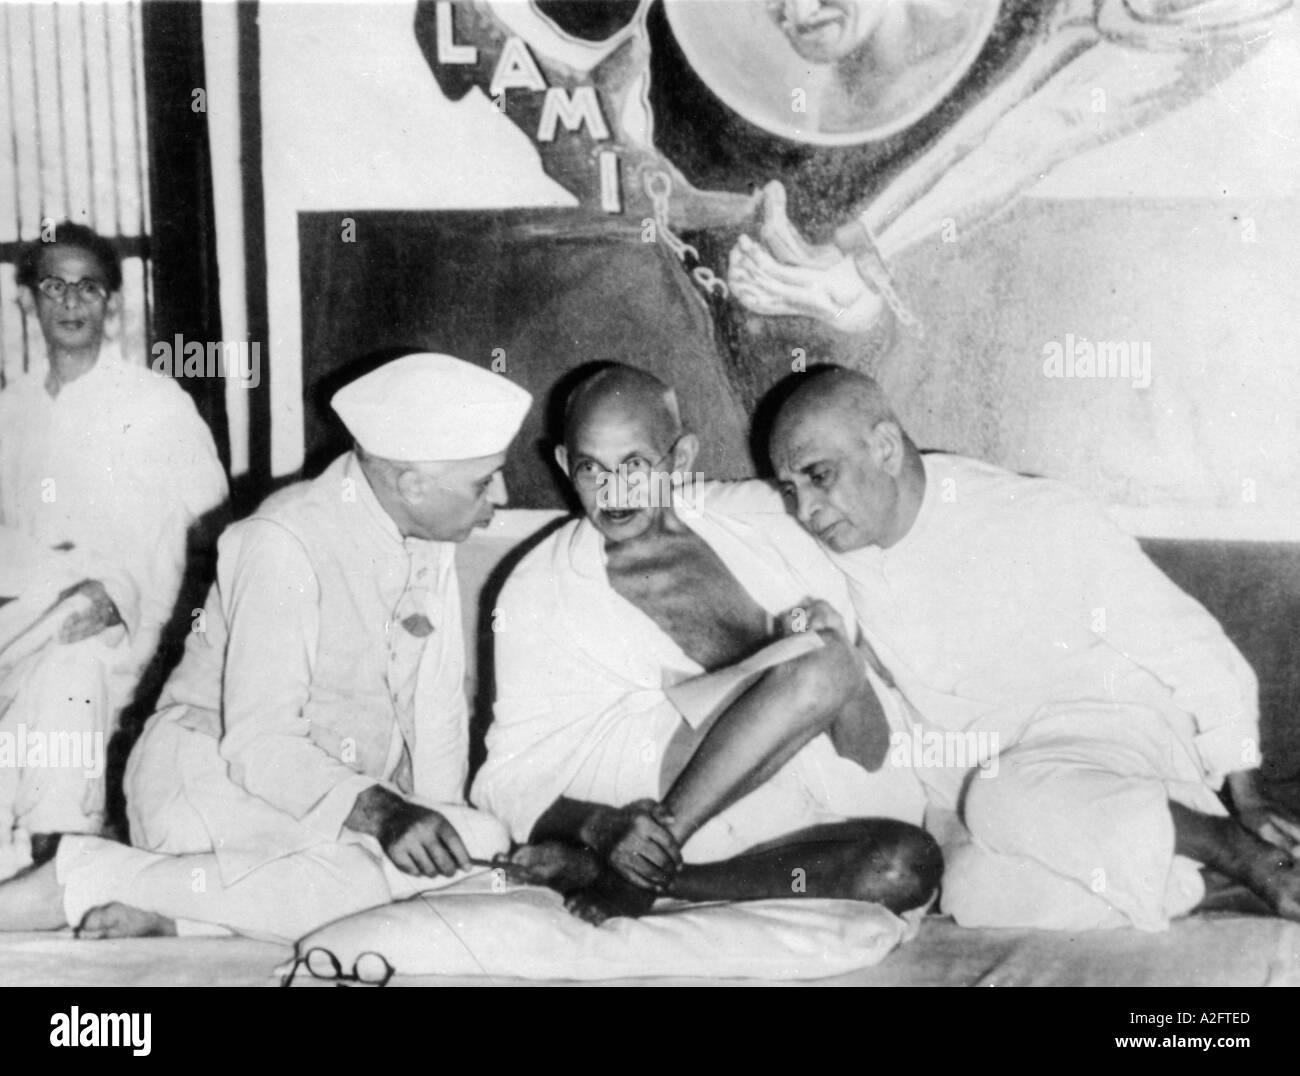 MKG33120 Mahatma Gandhi discutendo con Jawaharlal Nehru e Sardar Vallabhbhai Patel Immagini Stock